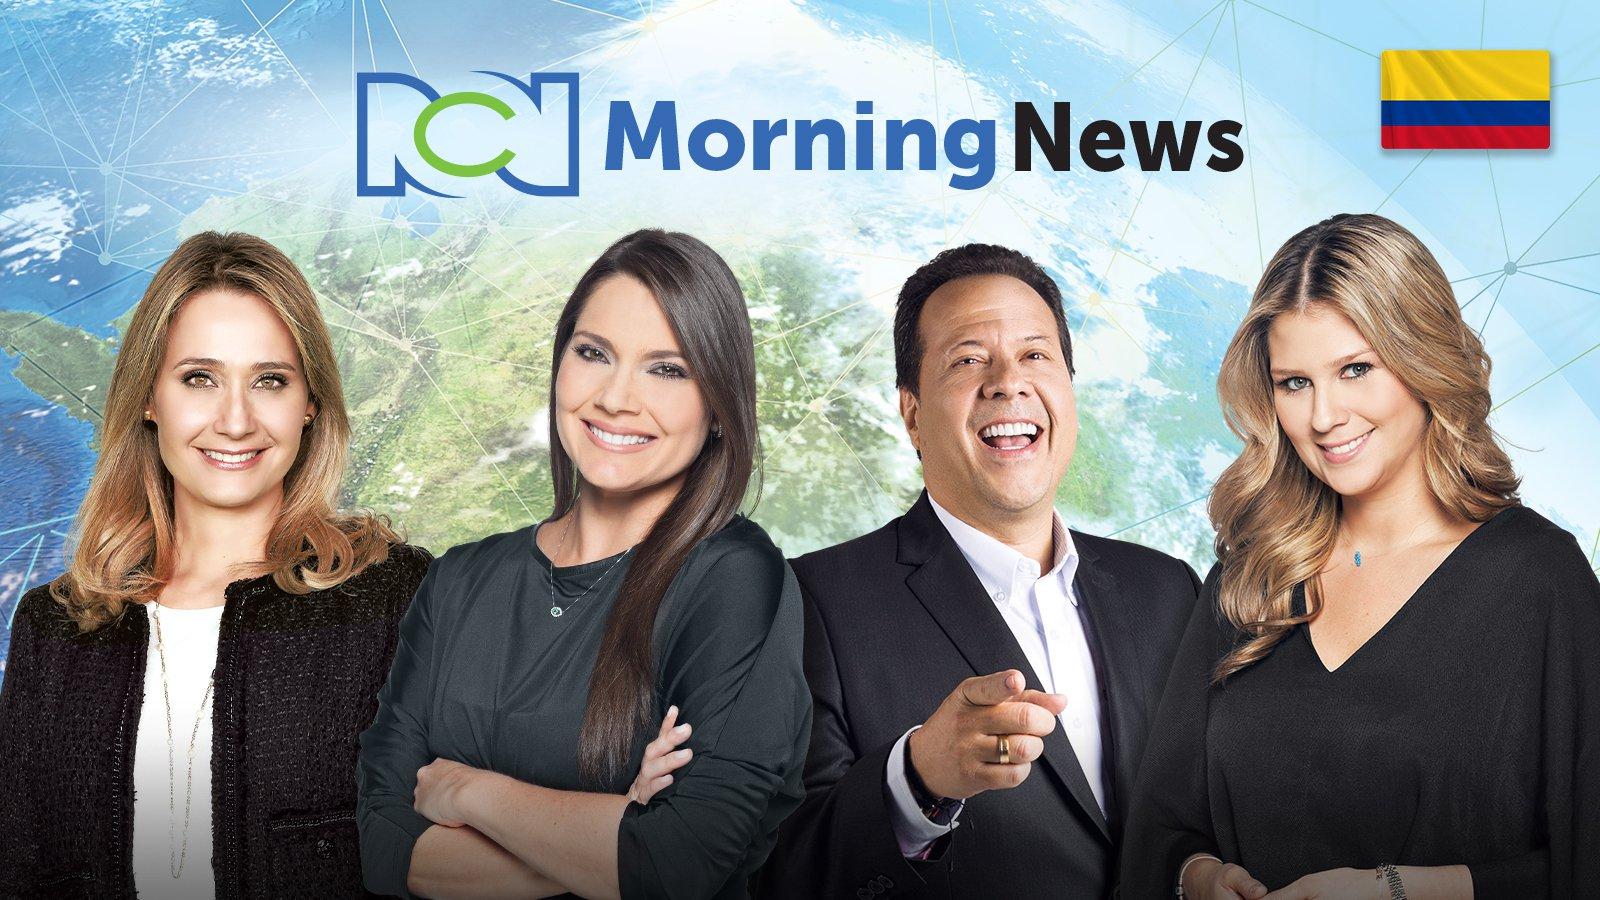 RCN Morning News poster